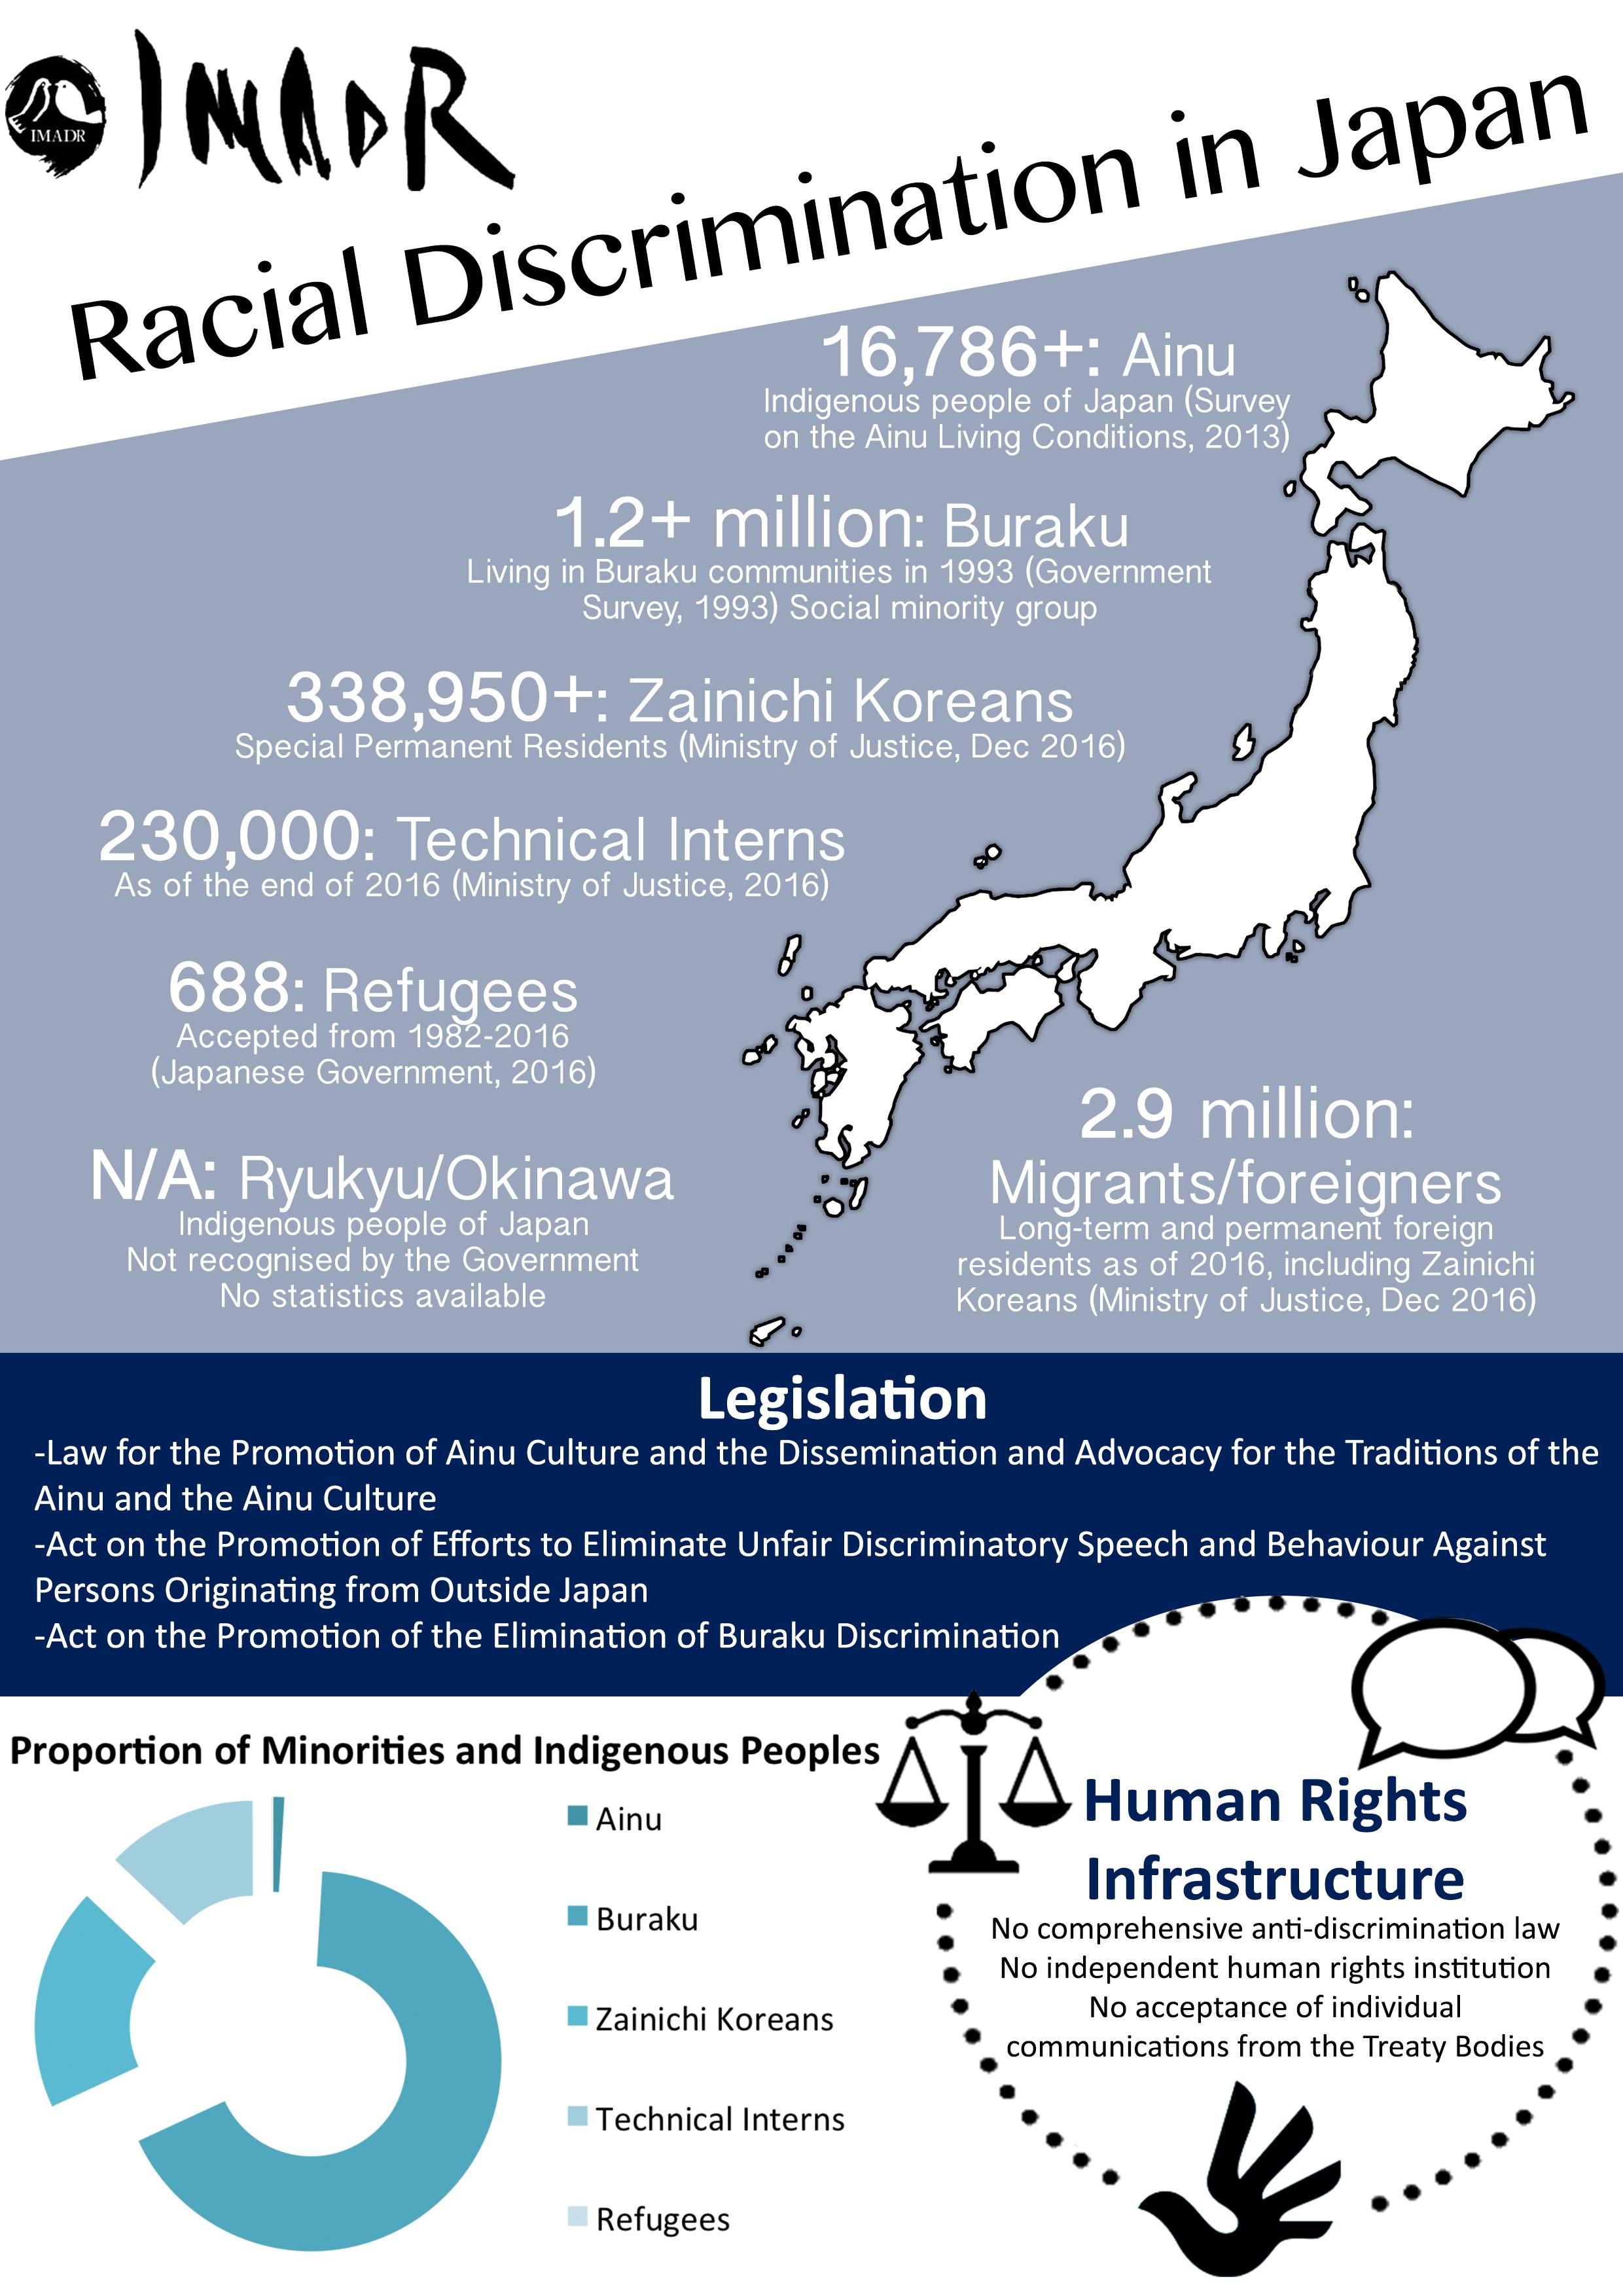 http://imadr.net/wordpress/wp-content/uploads/2017/10/UPR-Infographic.png